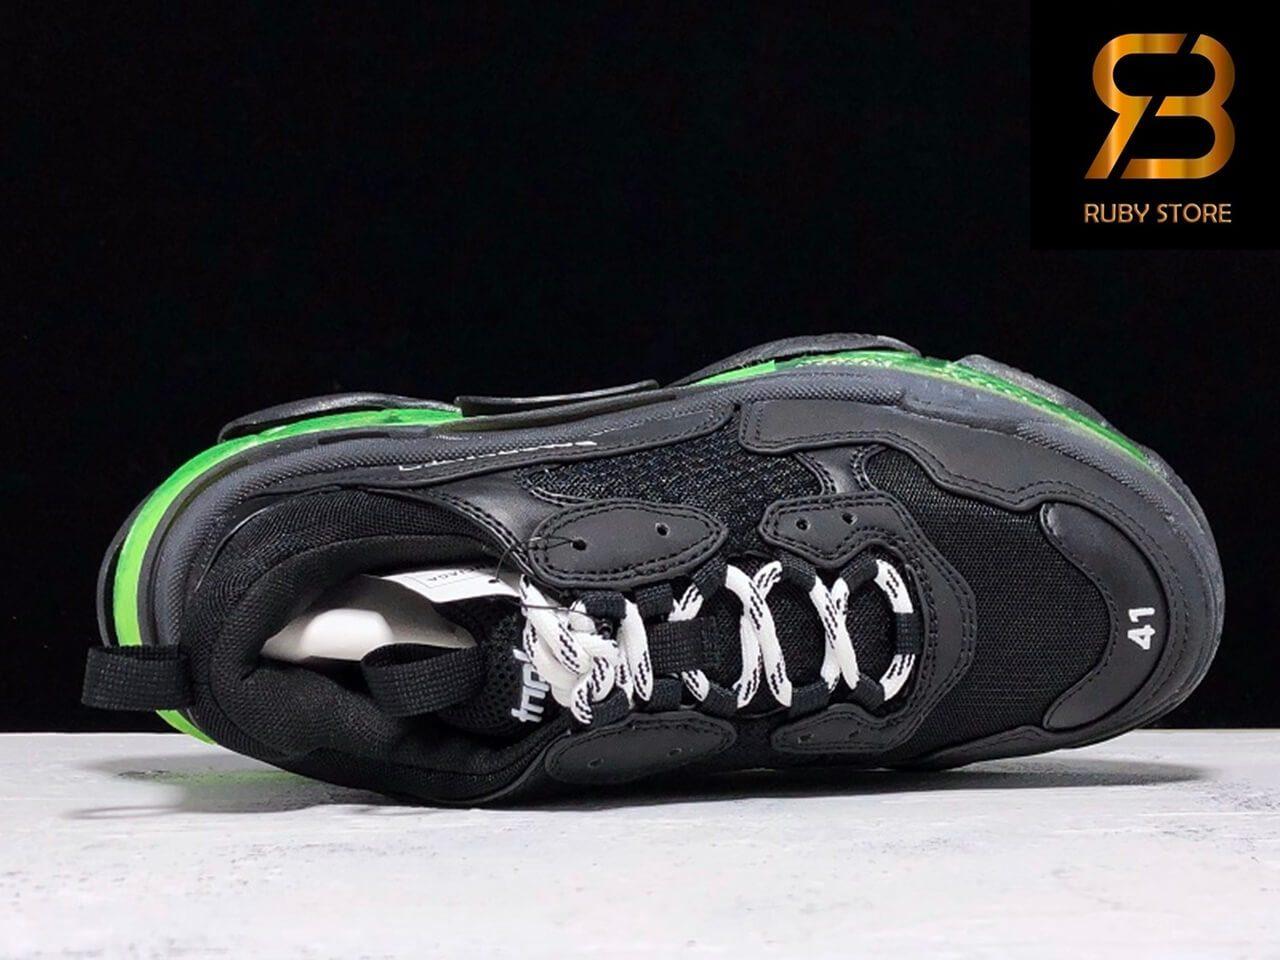 giày balenciaga triple s clear sole đen xanh siêu cấp